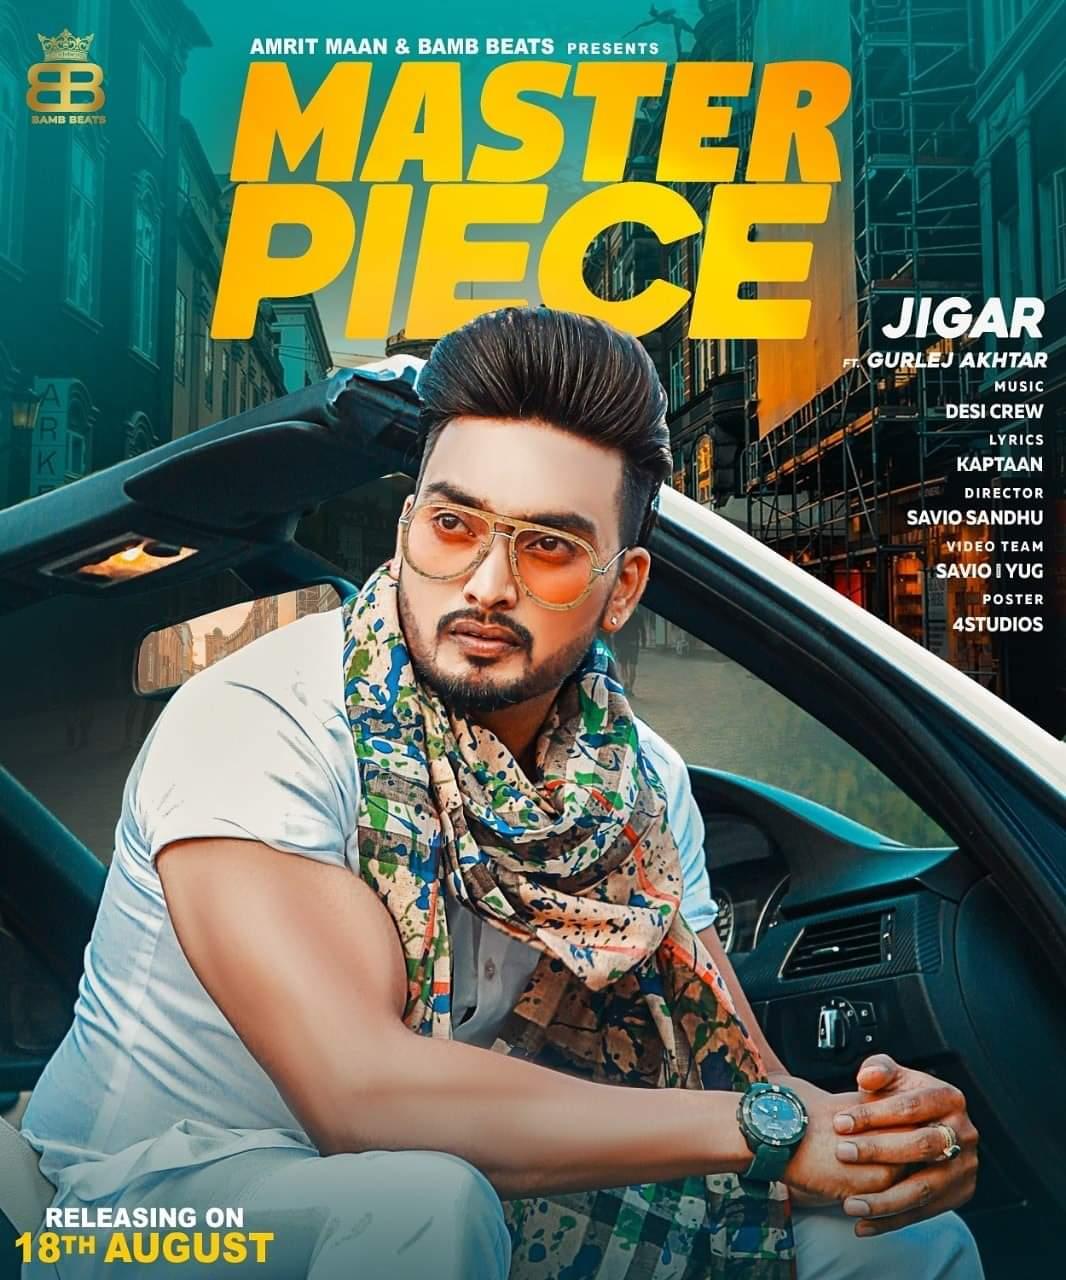 Master Piece Jigar Lyrics